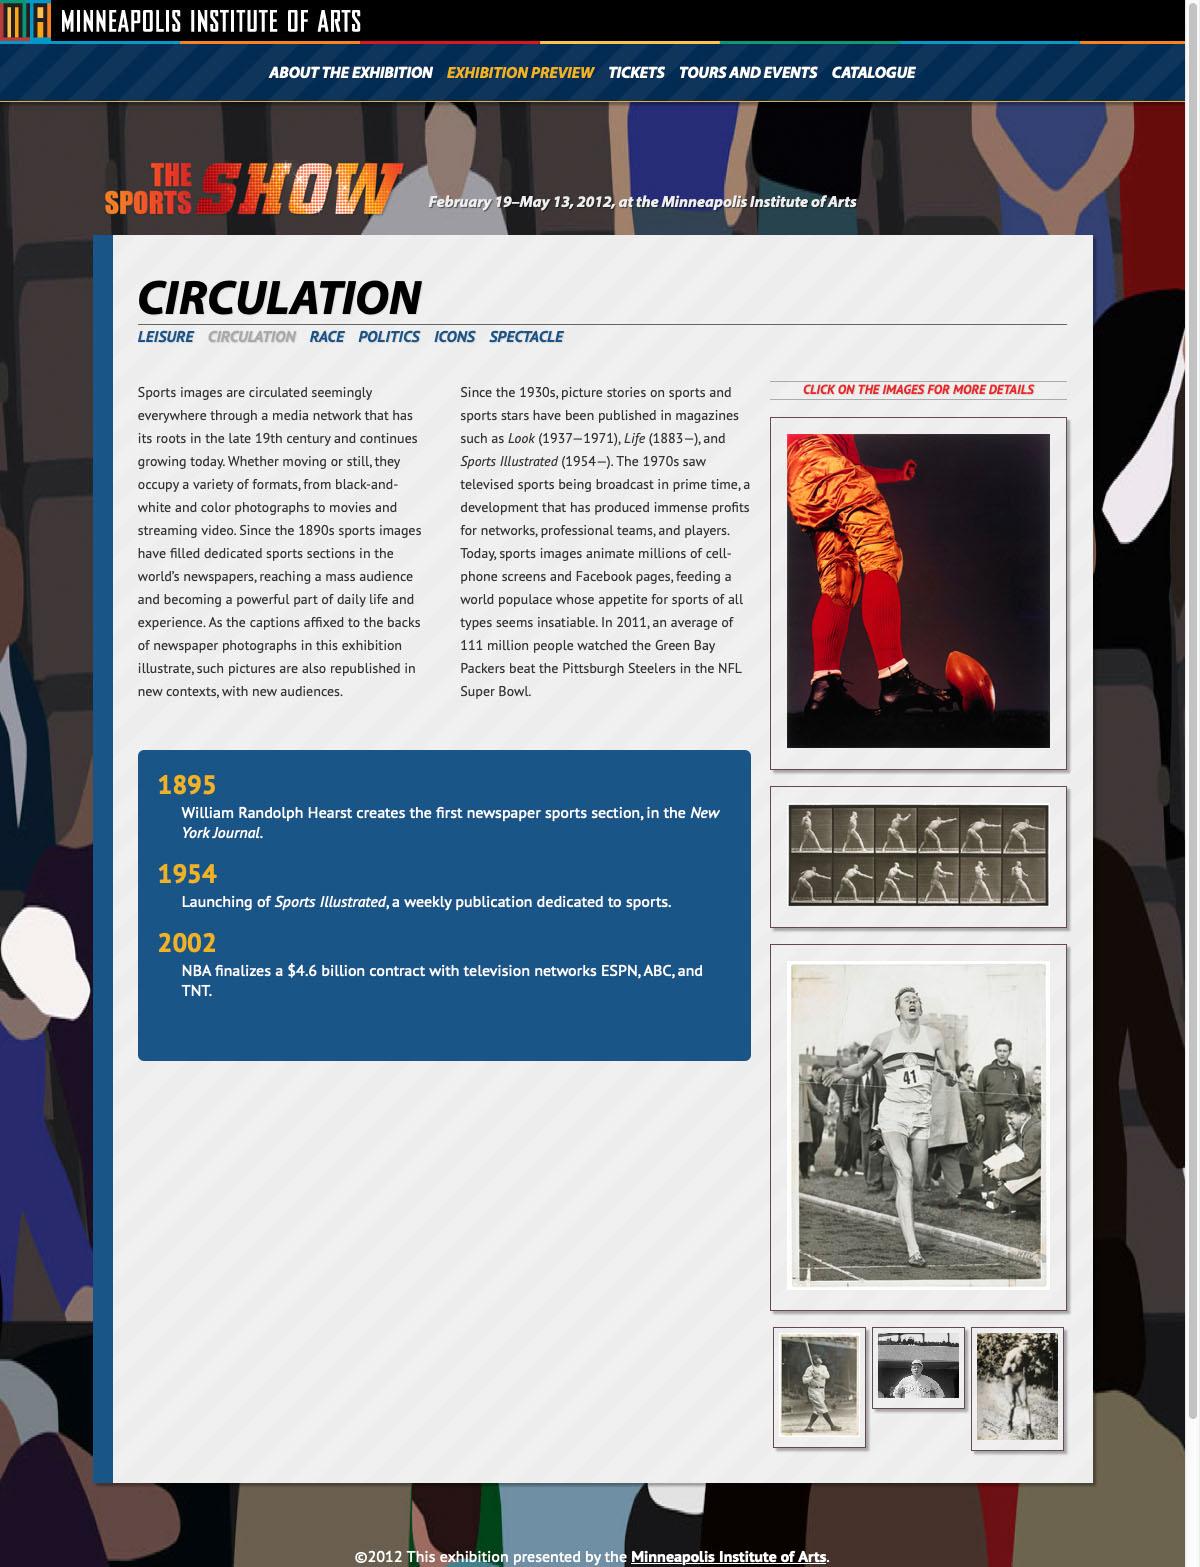 2012-02-19_Minneapolis Institute of Art, The Sports Show, 2012 003.jpg